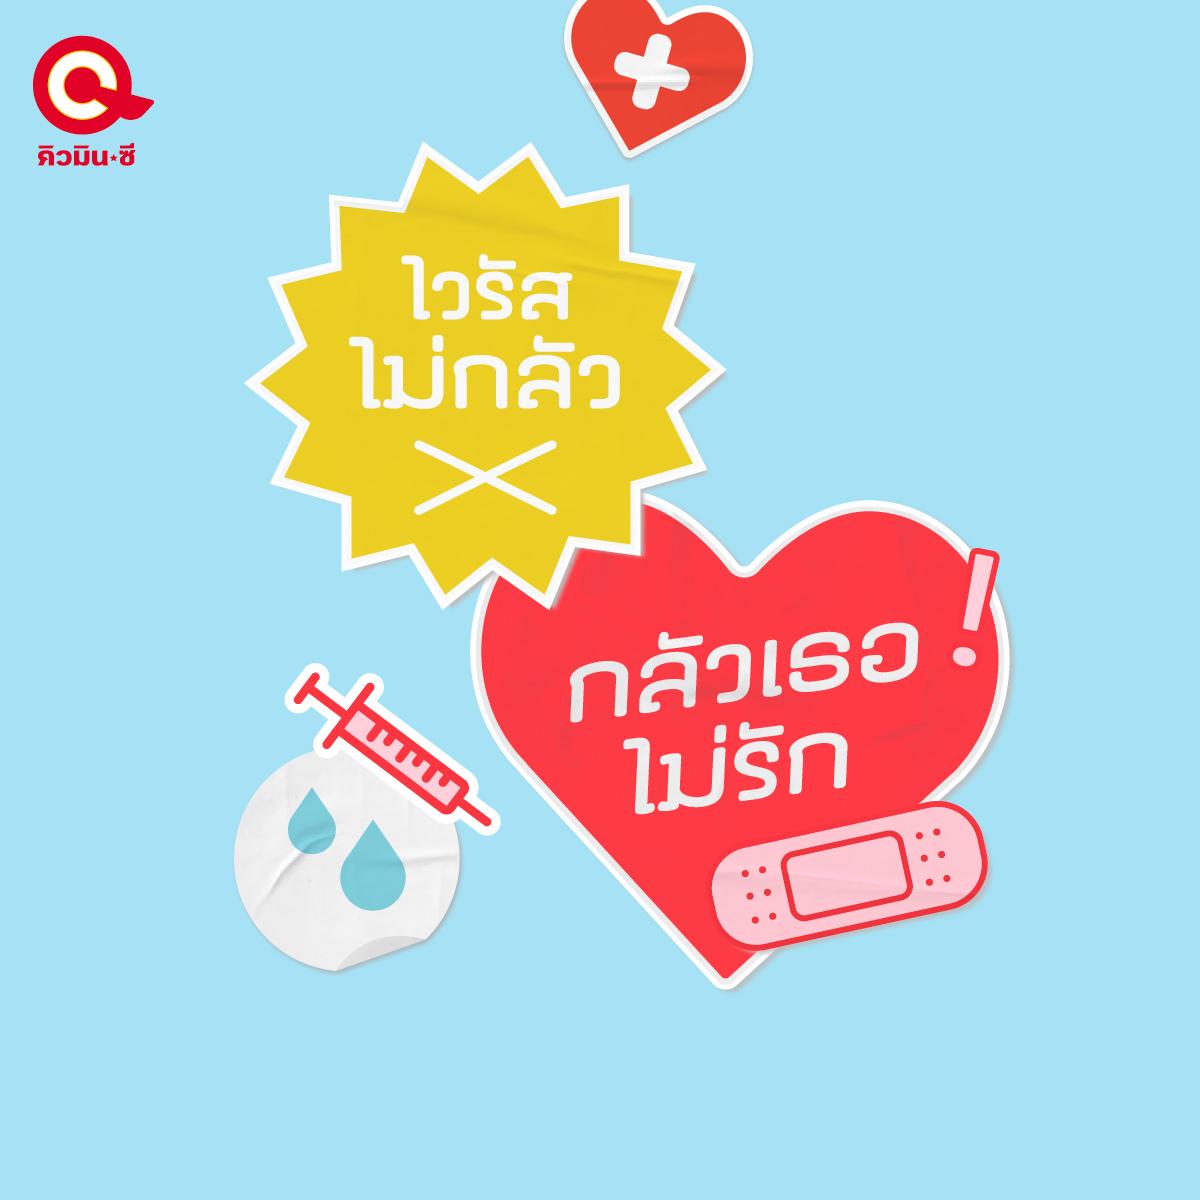 qminc-for-valentine-day 01